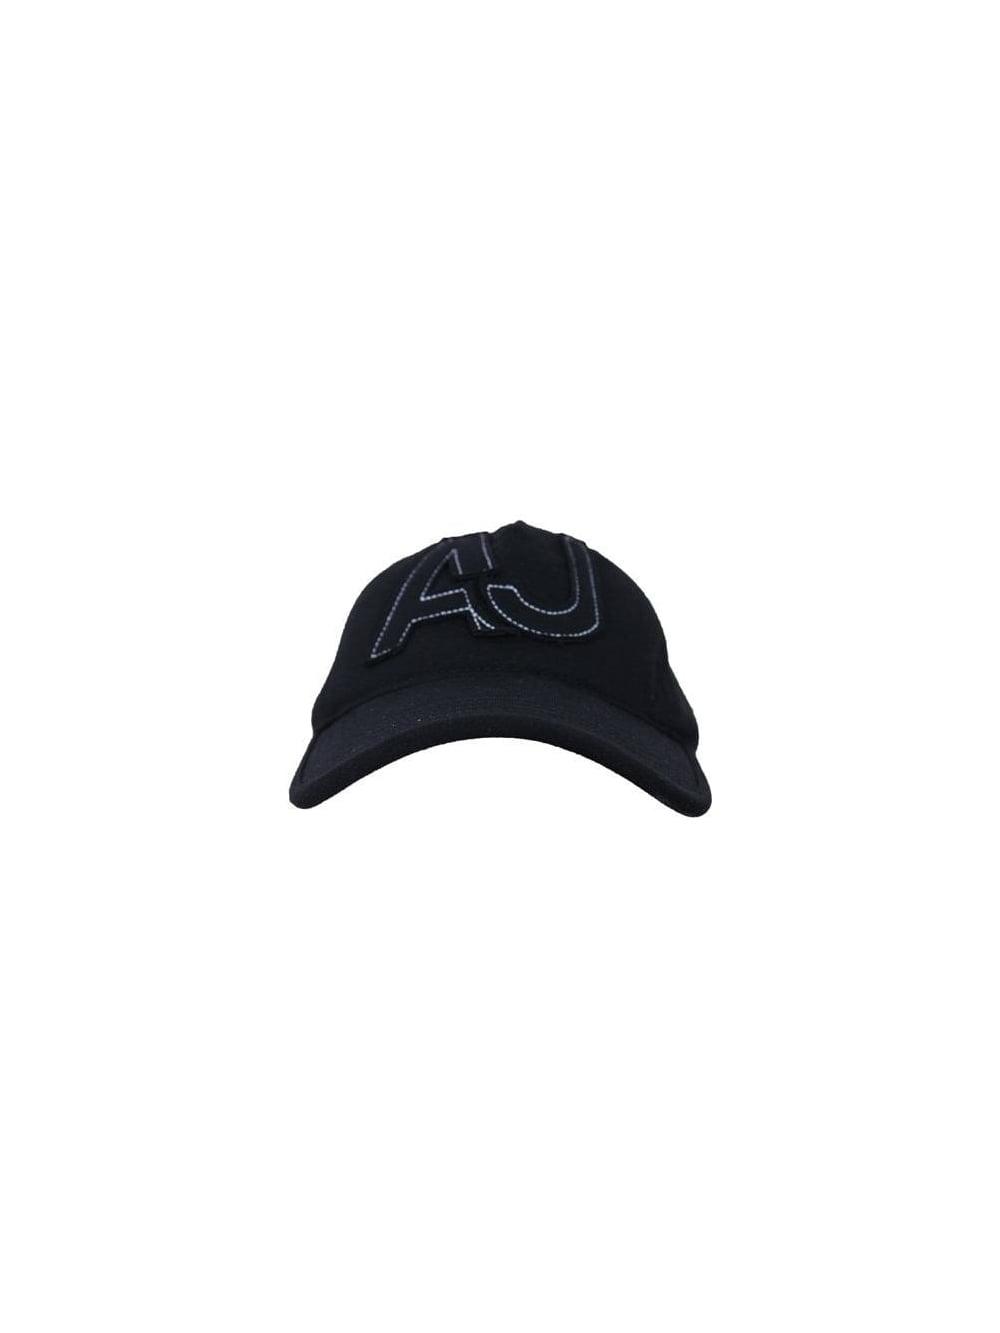 Armani Jeans Applique Velcro Fastening Cap in Black - Northern Threads 451baa44937